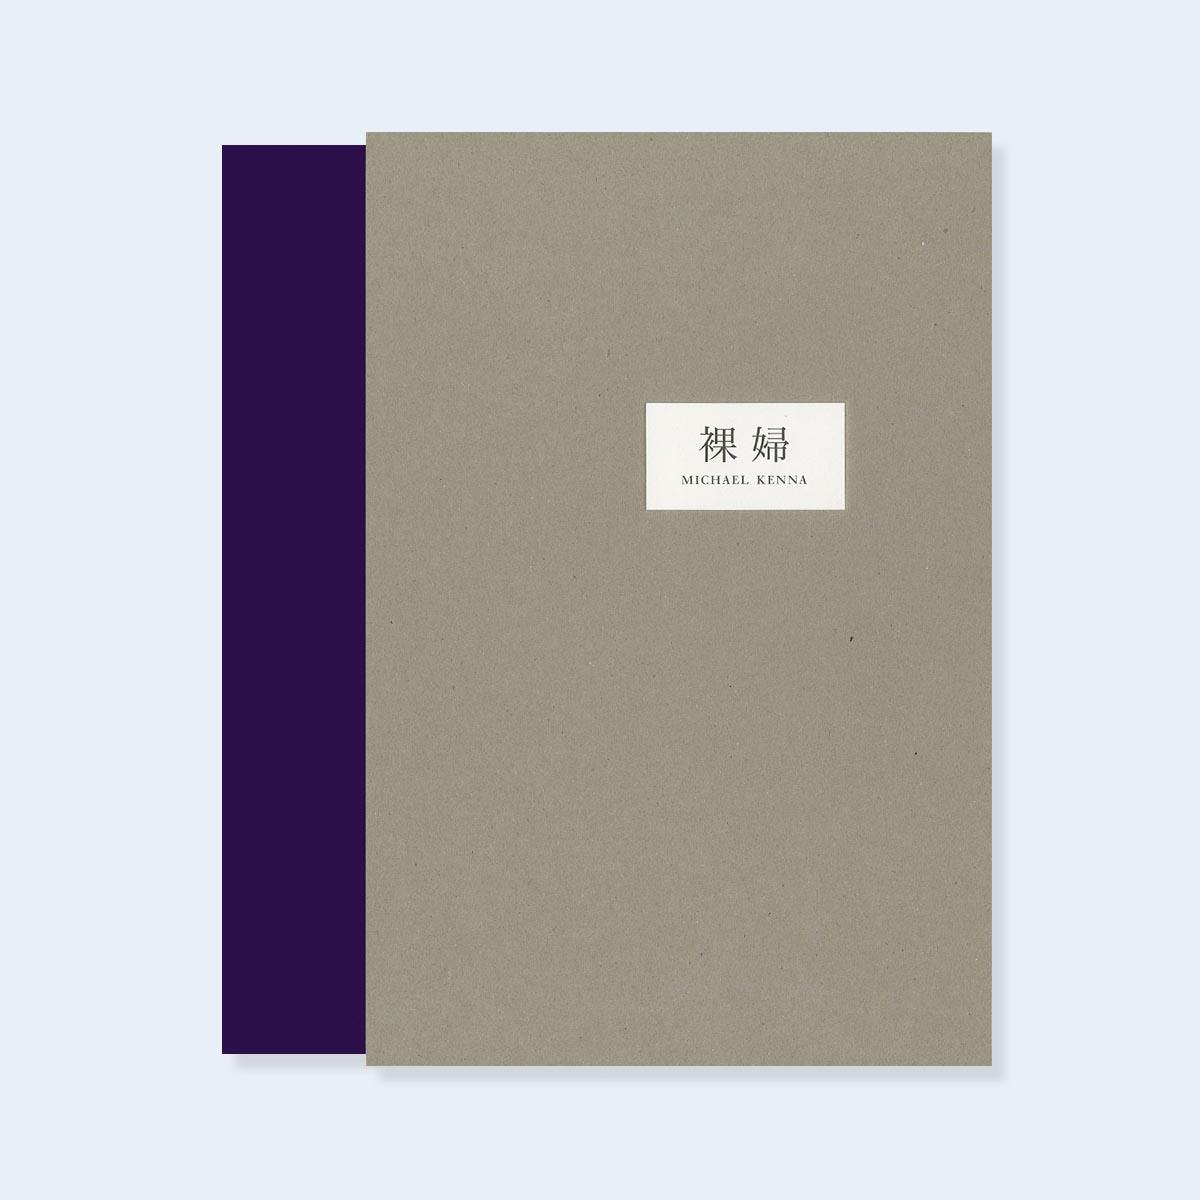 COMING SOON  MICHAEL KENNA  |   Rafu (Limited Edition)  |  Order >